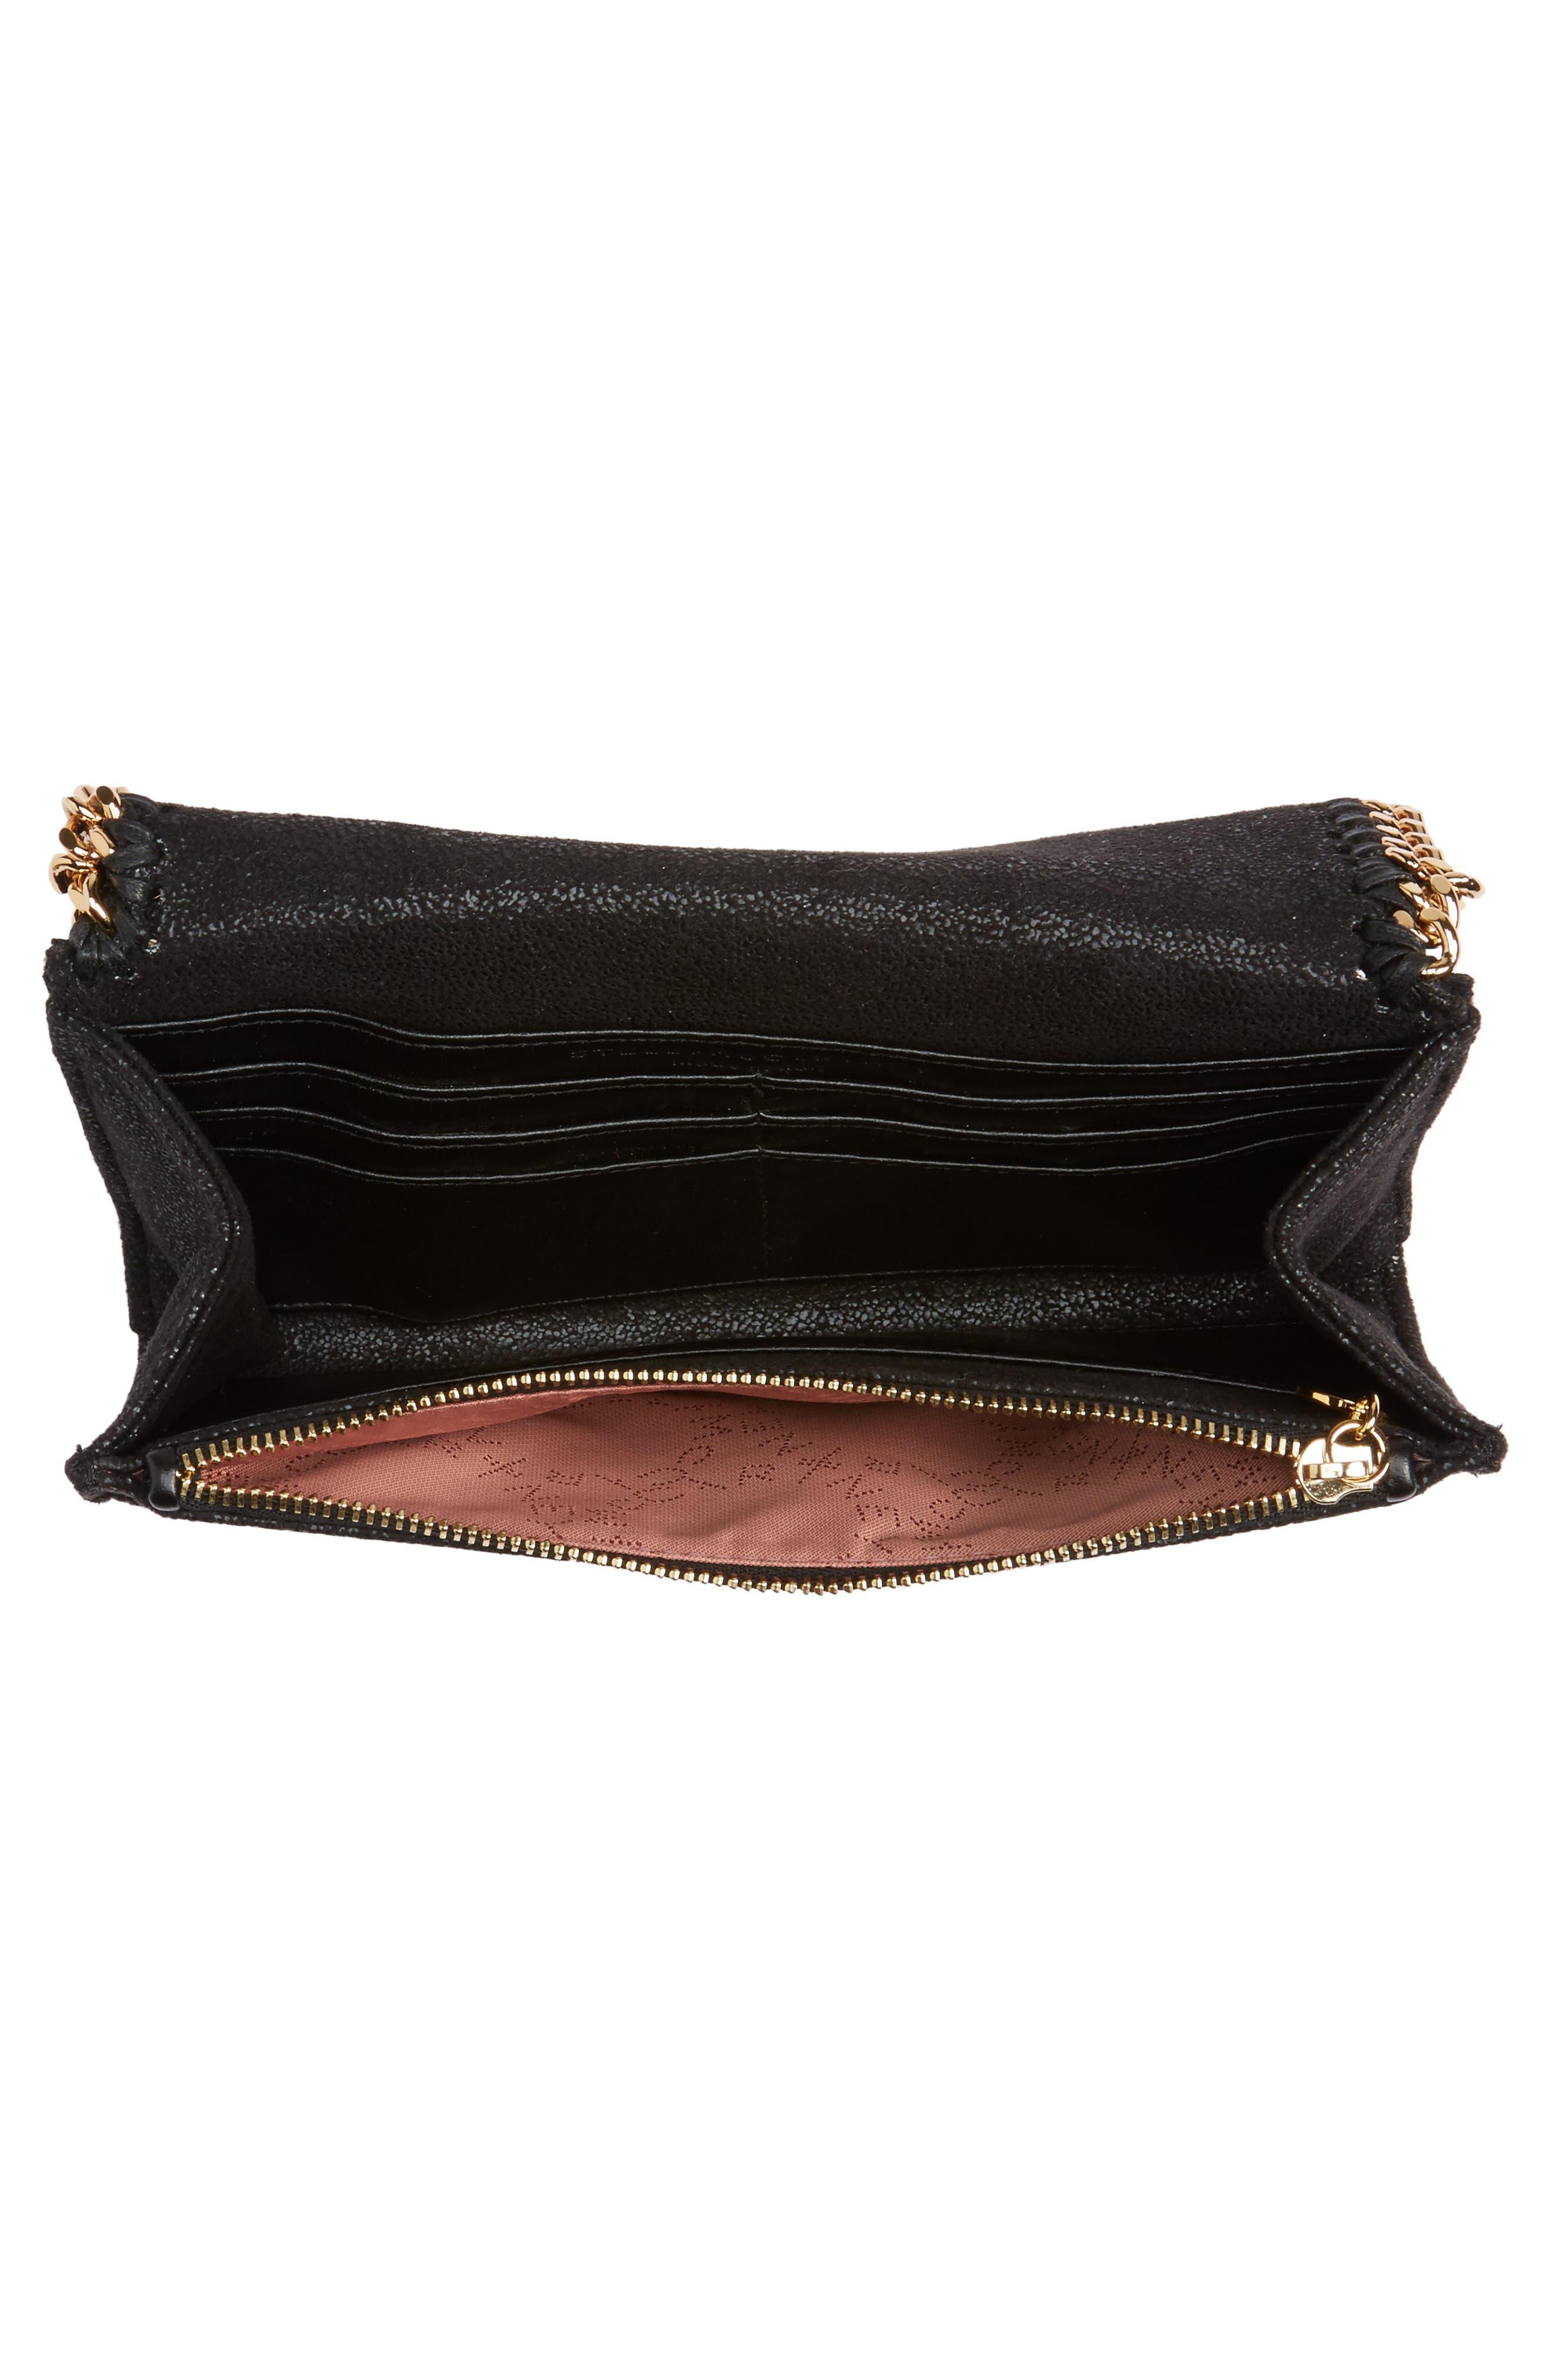 Shaggy Deer Faux Leather Crossbody Bag,                             Alternate thumbnail 4, color,                             BLACK